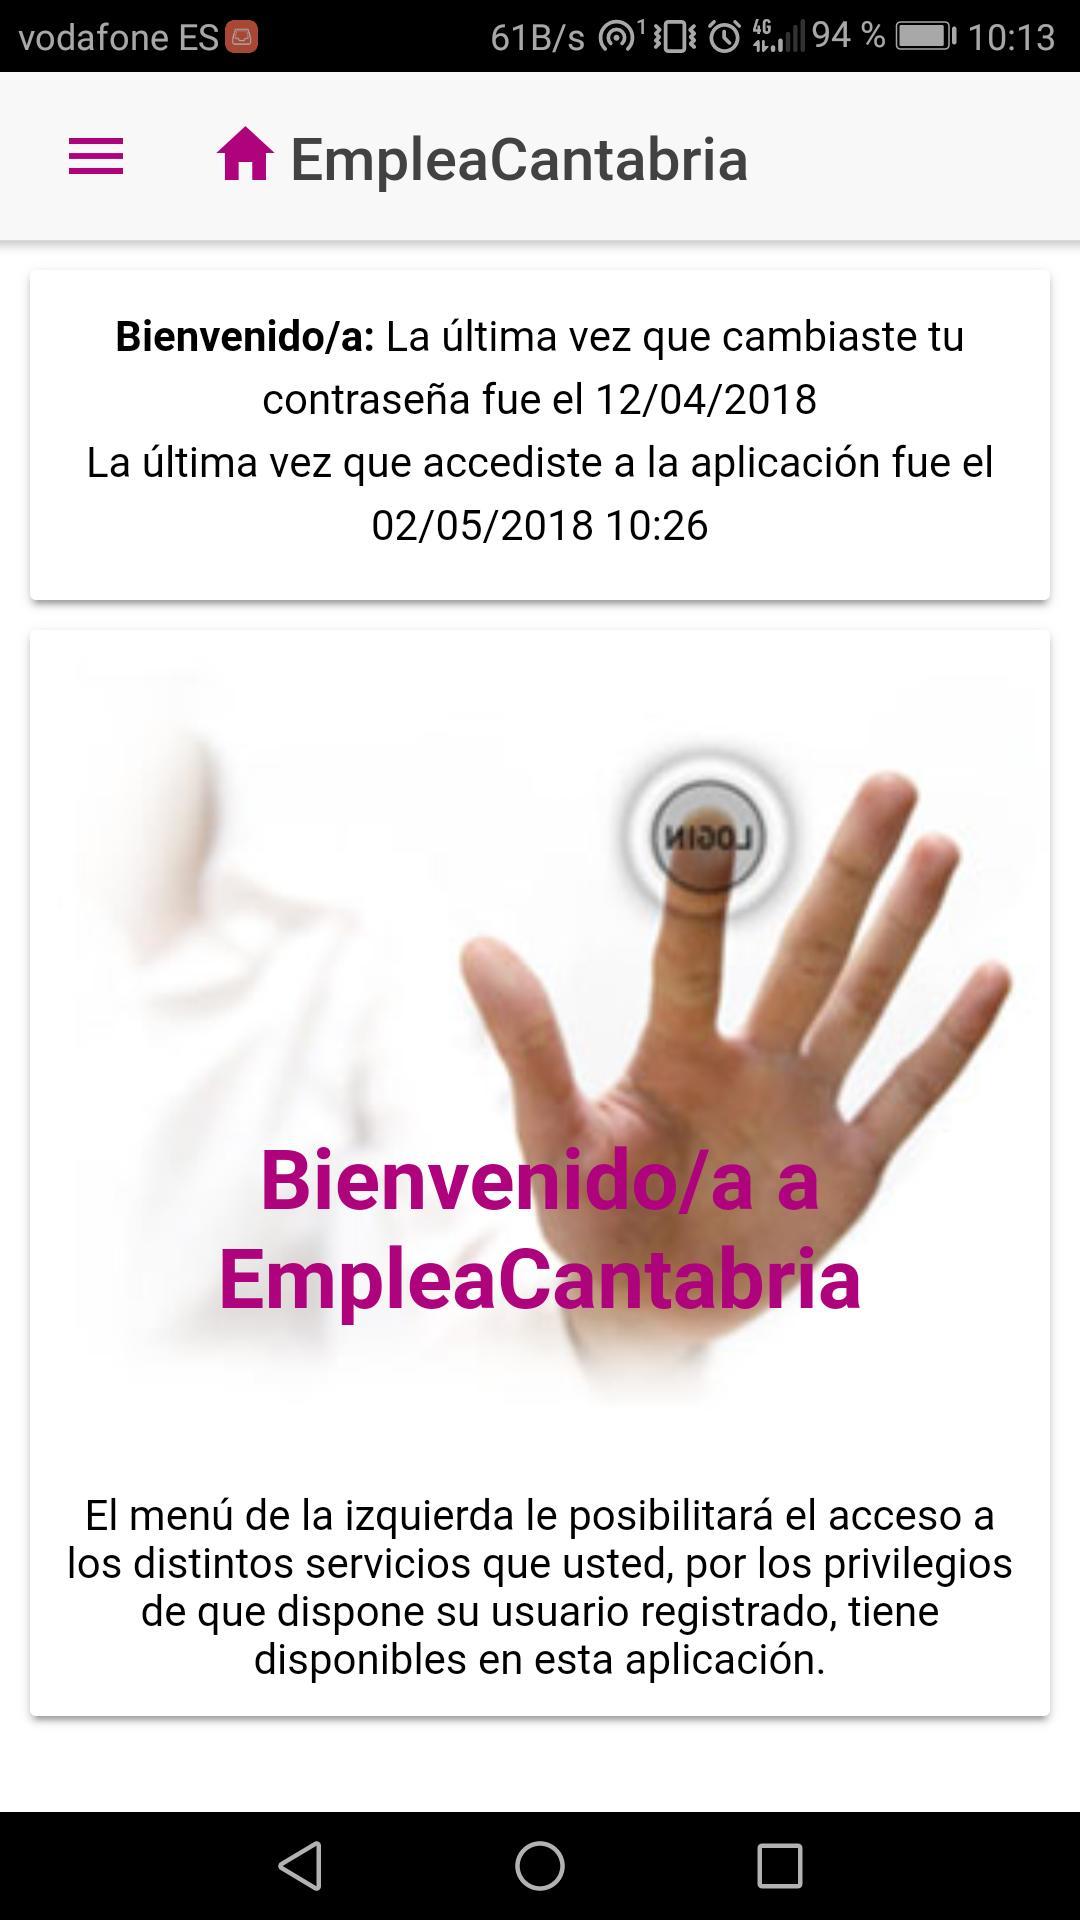 Servicio Cántabro de Empleo poster